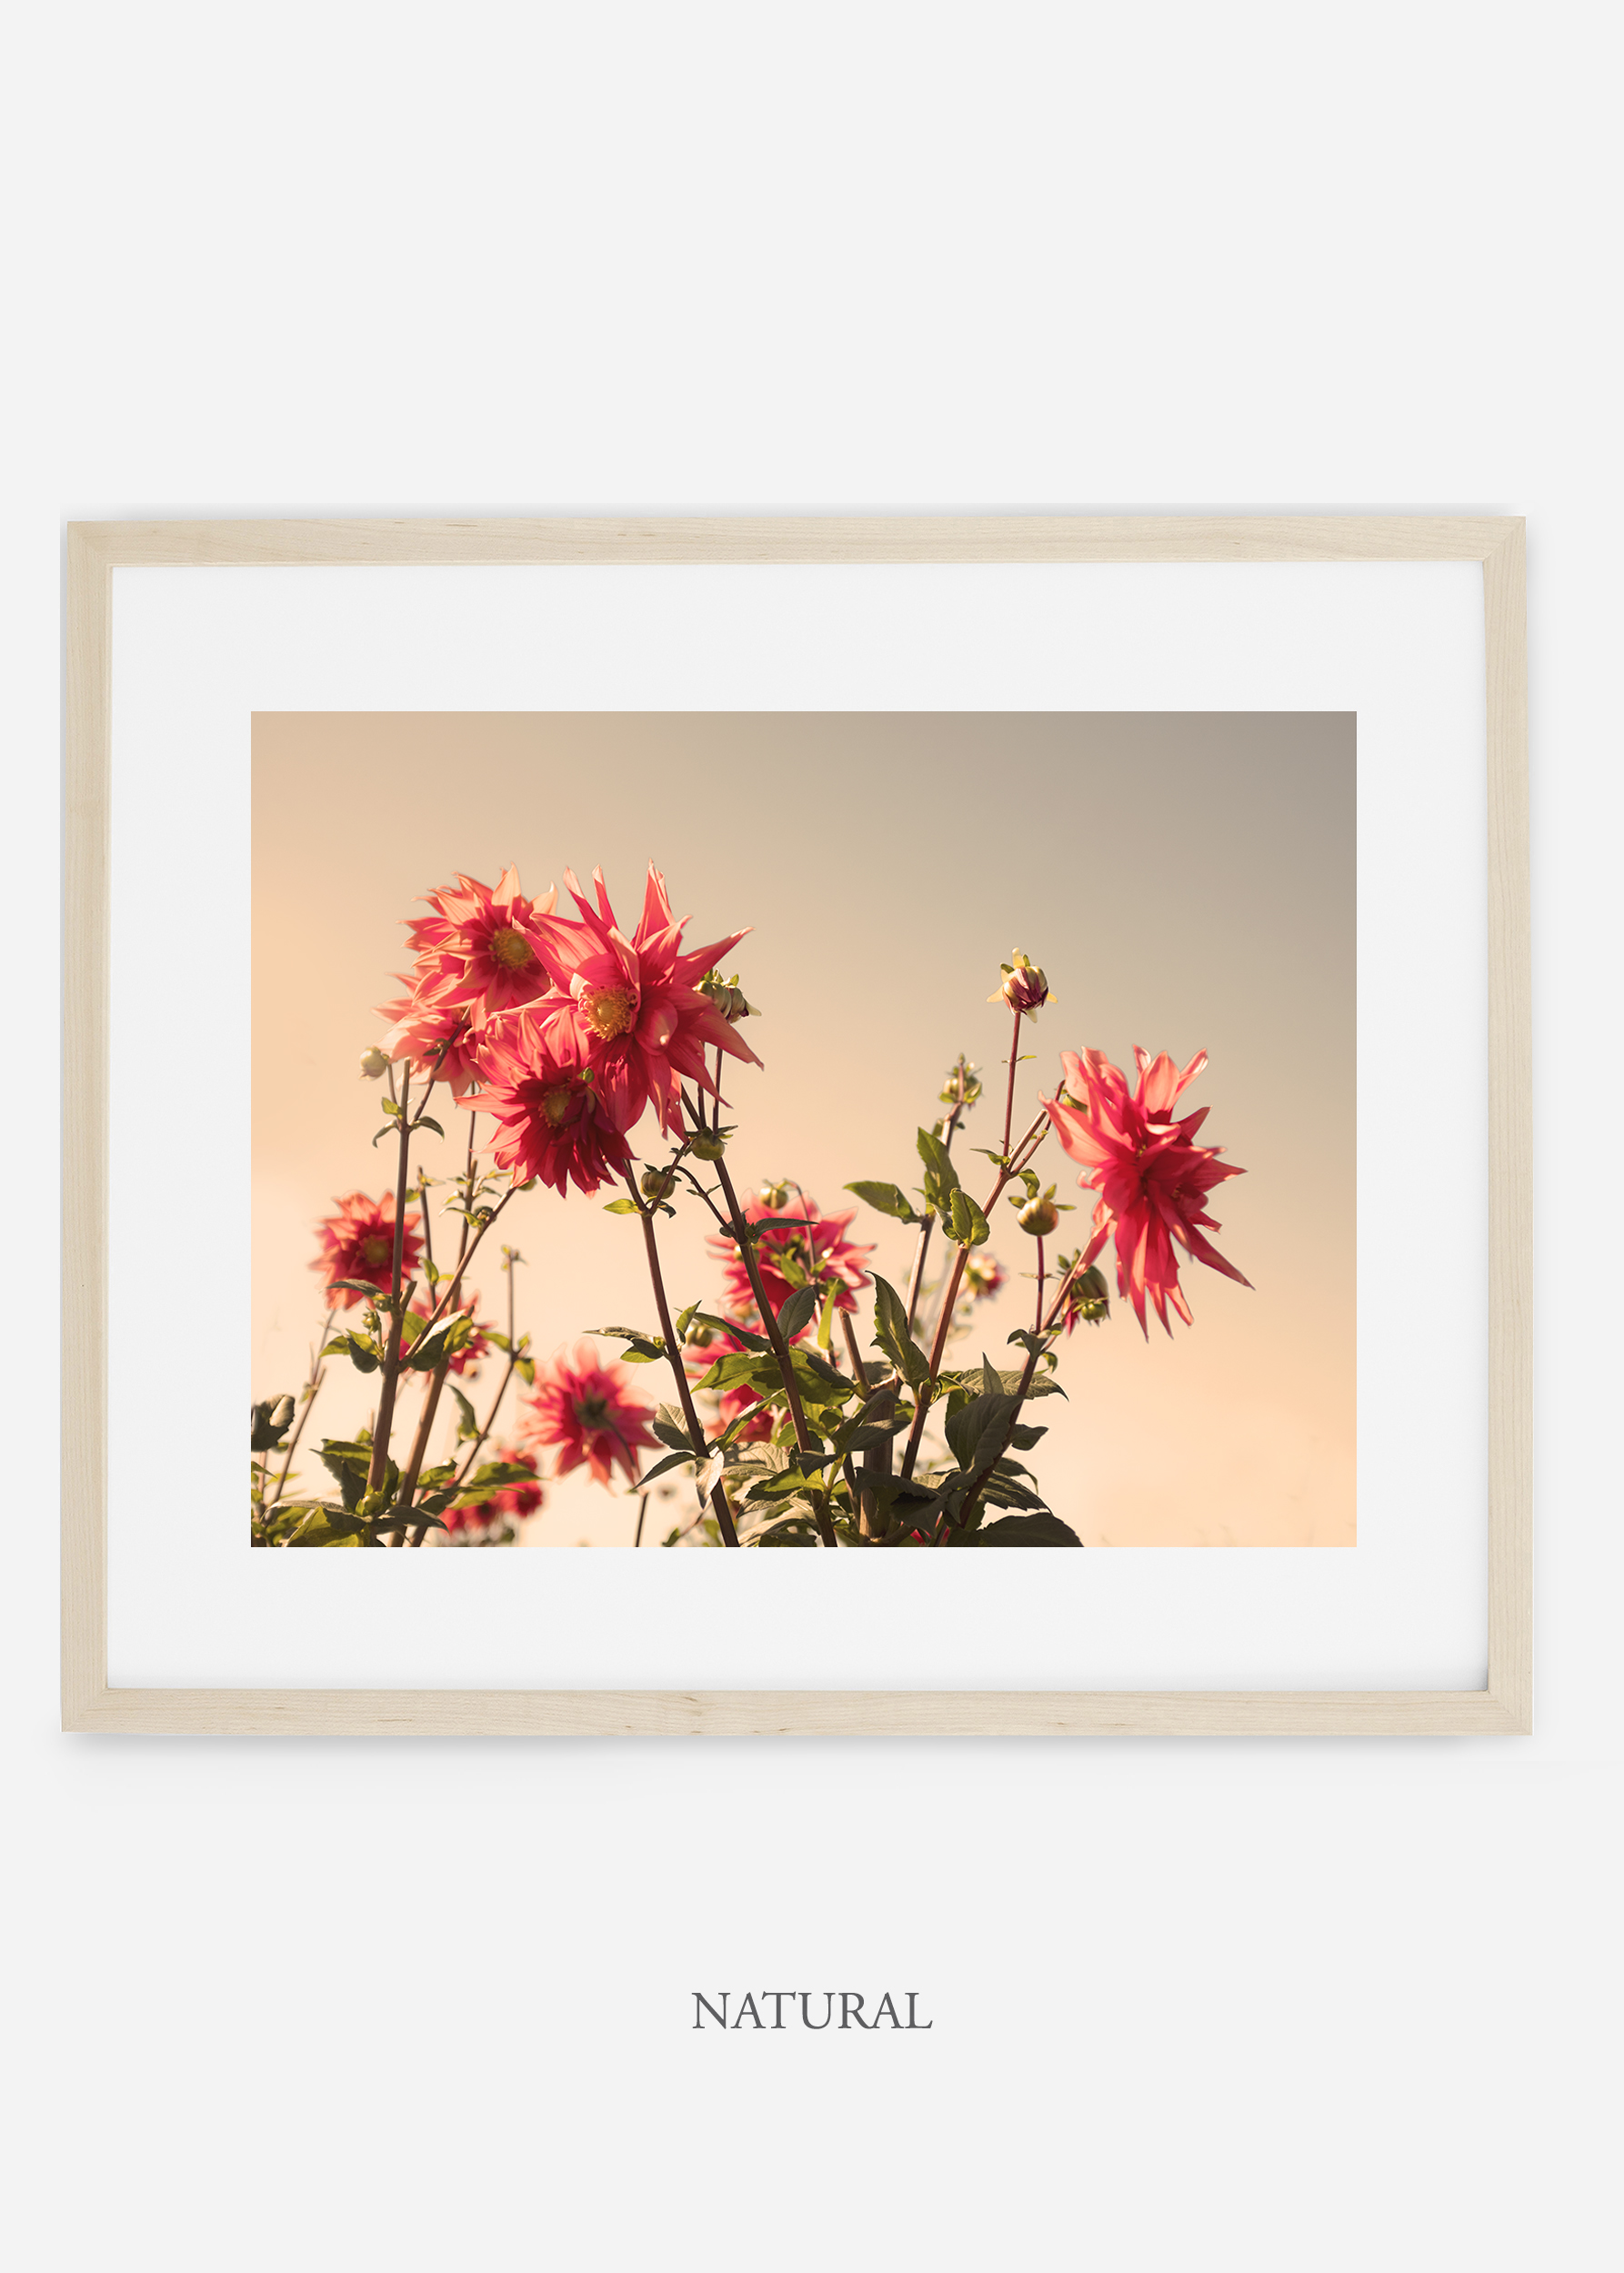 wilder-california-naturalframe-dahlia-9-minimal-botanical-print-art-interior-design.jpg